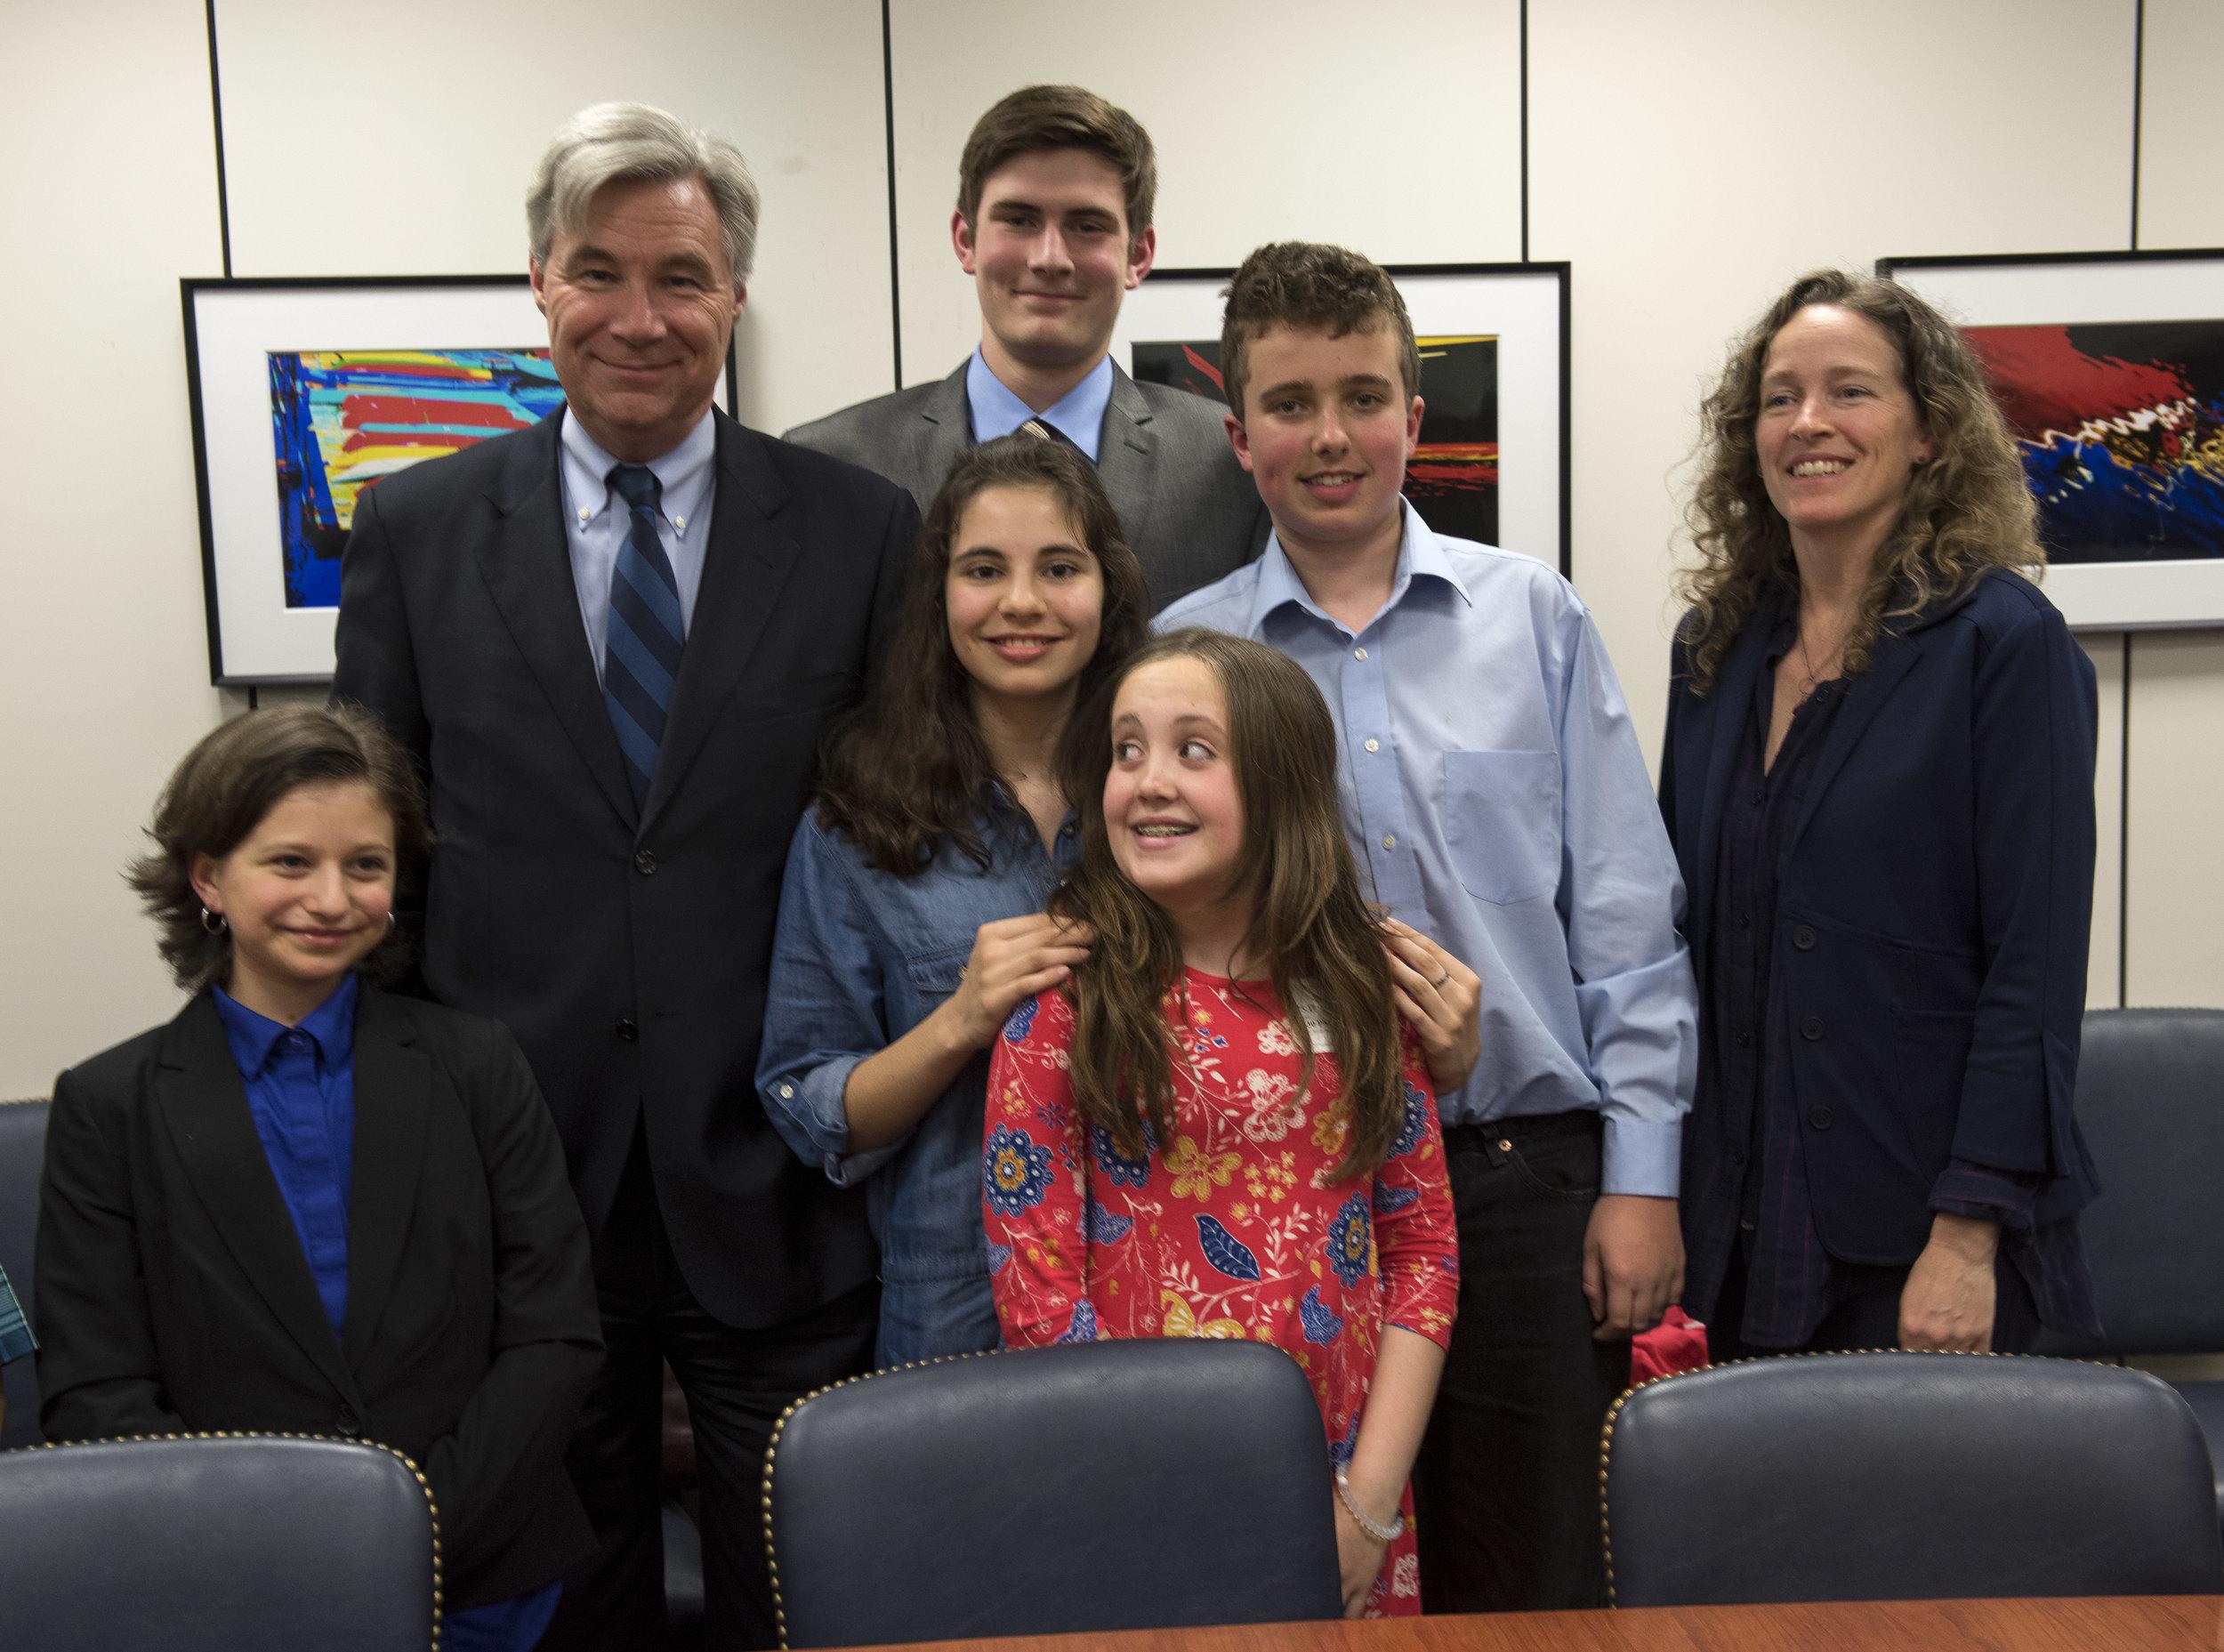 Nathan with Senator Sheldon Whitehouse, fellow #youthvgov plaintiffs and co-lead counsel Julia Olson on Capitol Hill, April 2017. Photo: Robin Loznak